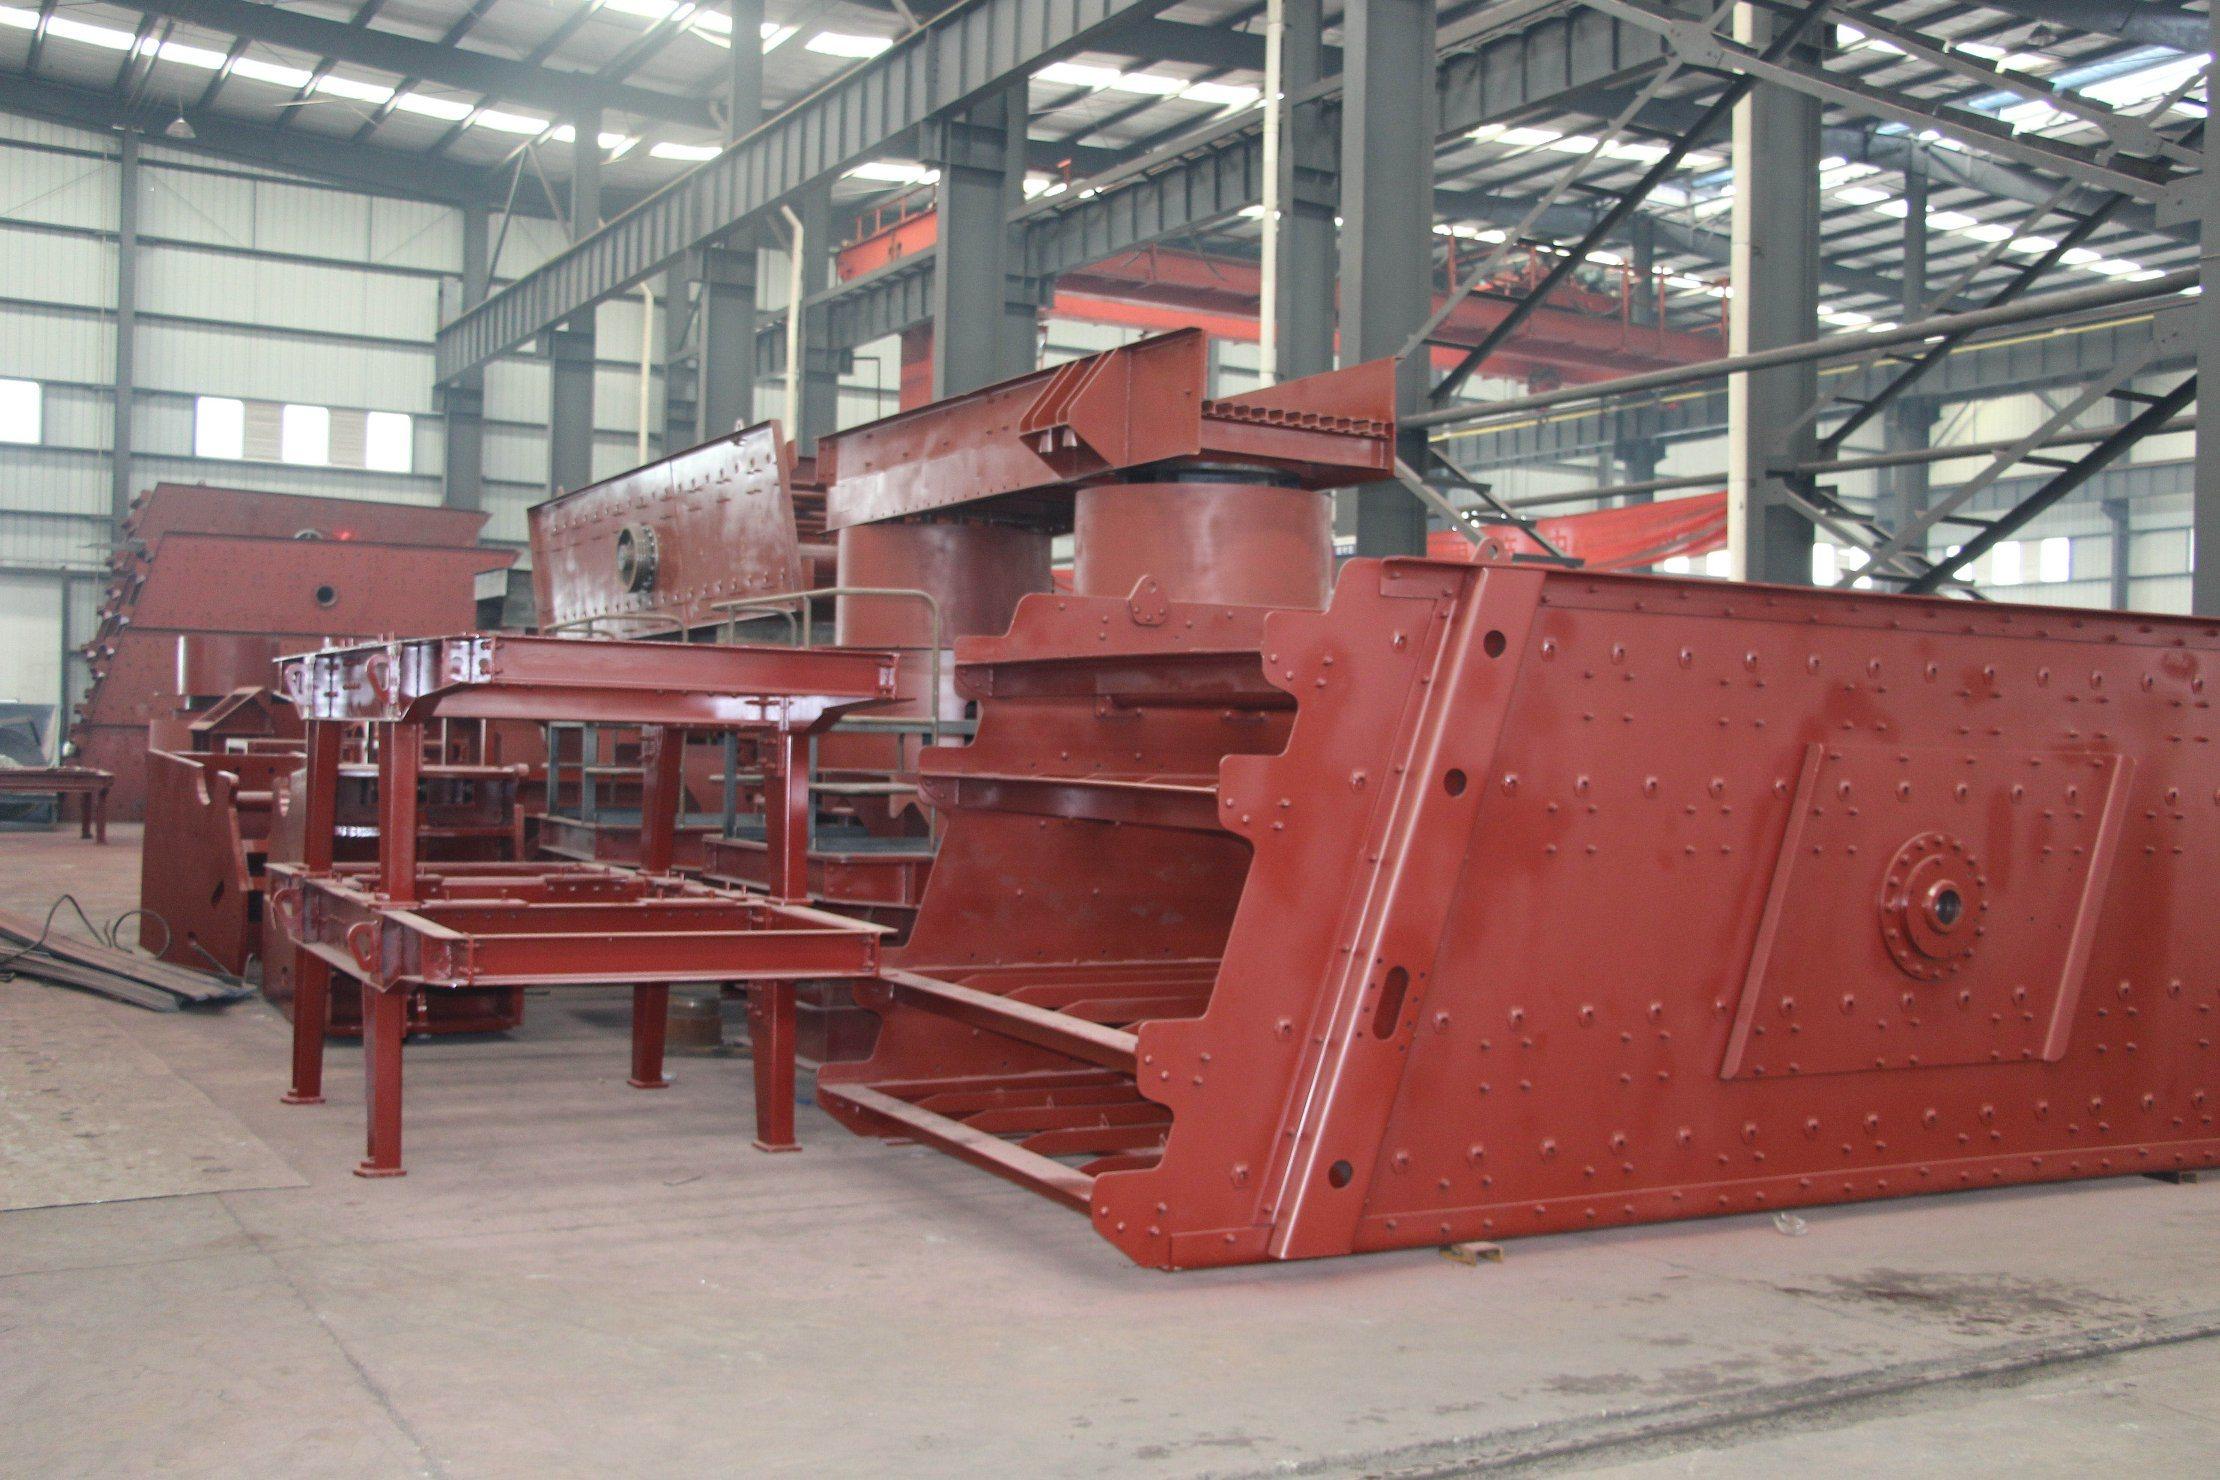 Rotary Screen Vibrating Machine for Mining Equipment